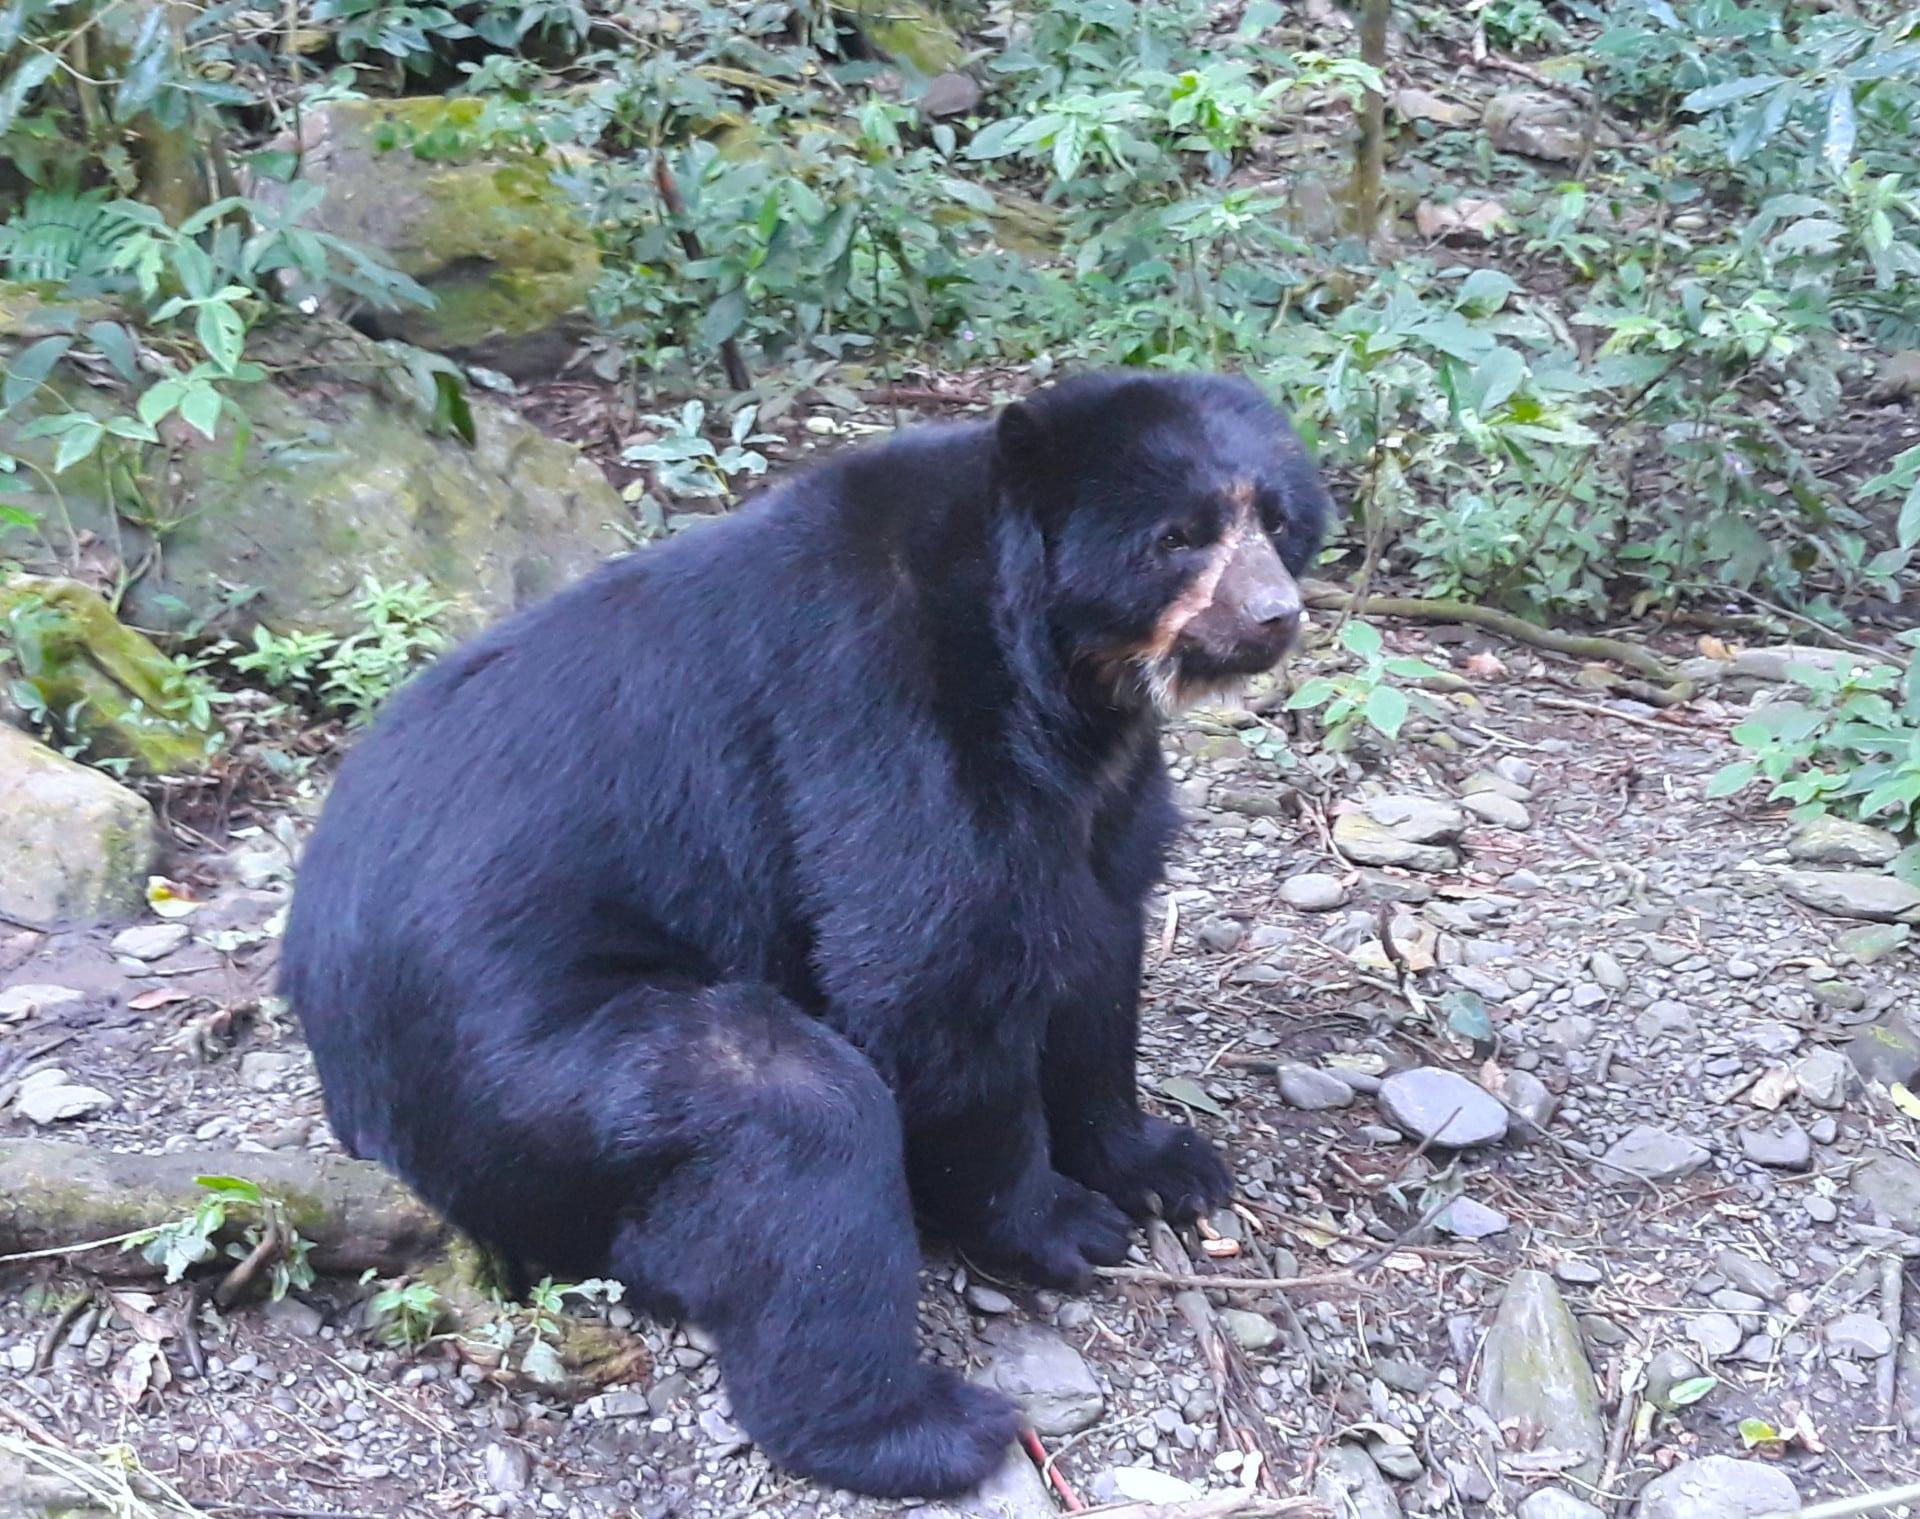 L'ours à Lunettes Dans Le Refuge Senda Verde, Bolivie